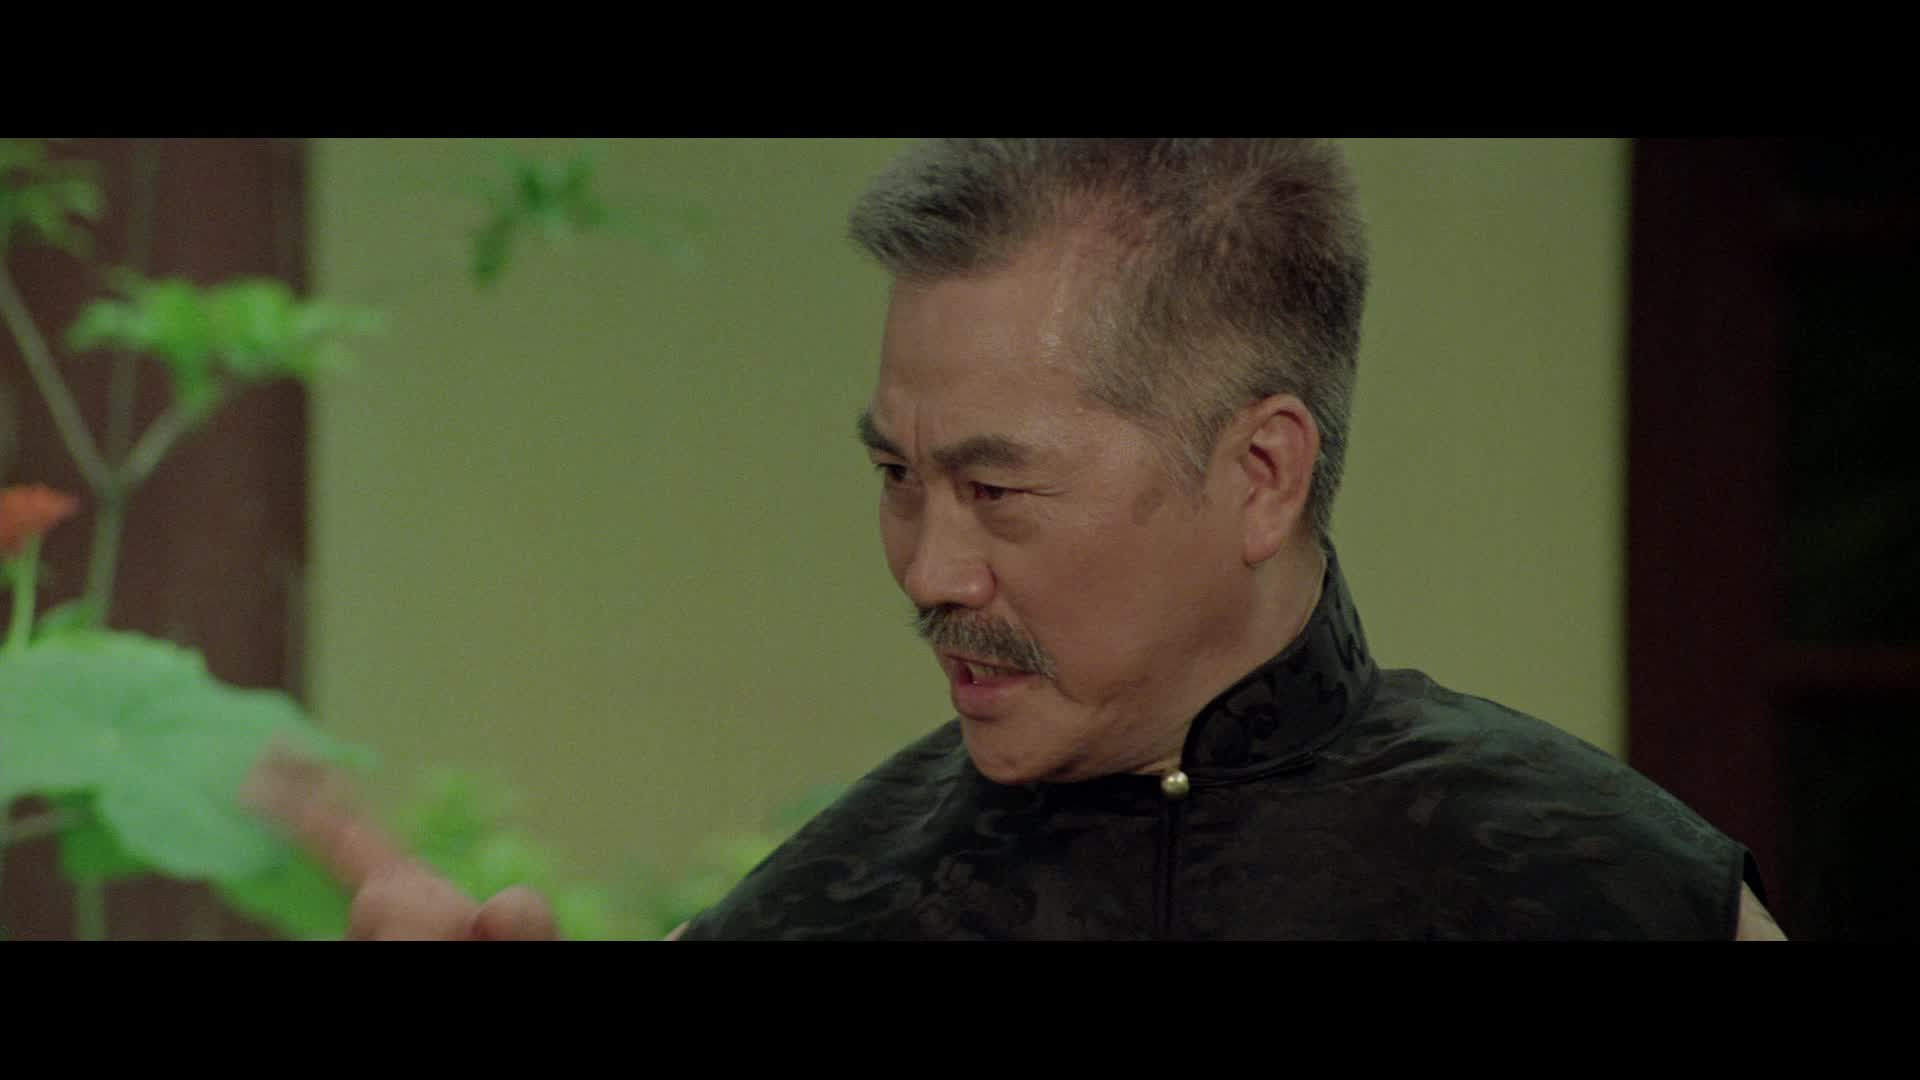 Drunken Master download di film interi in hd